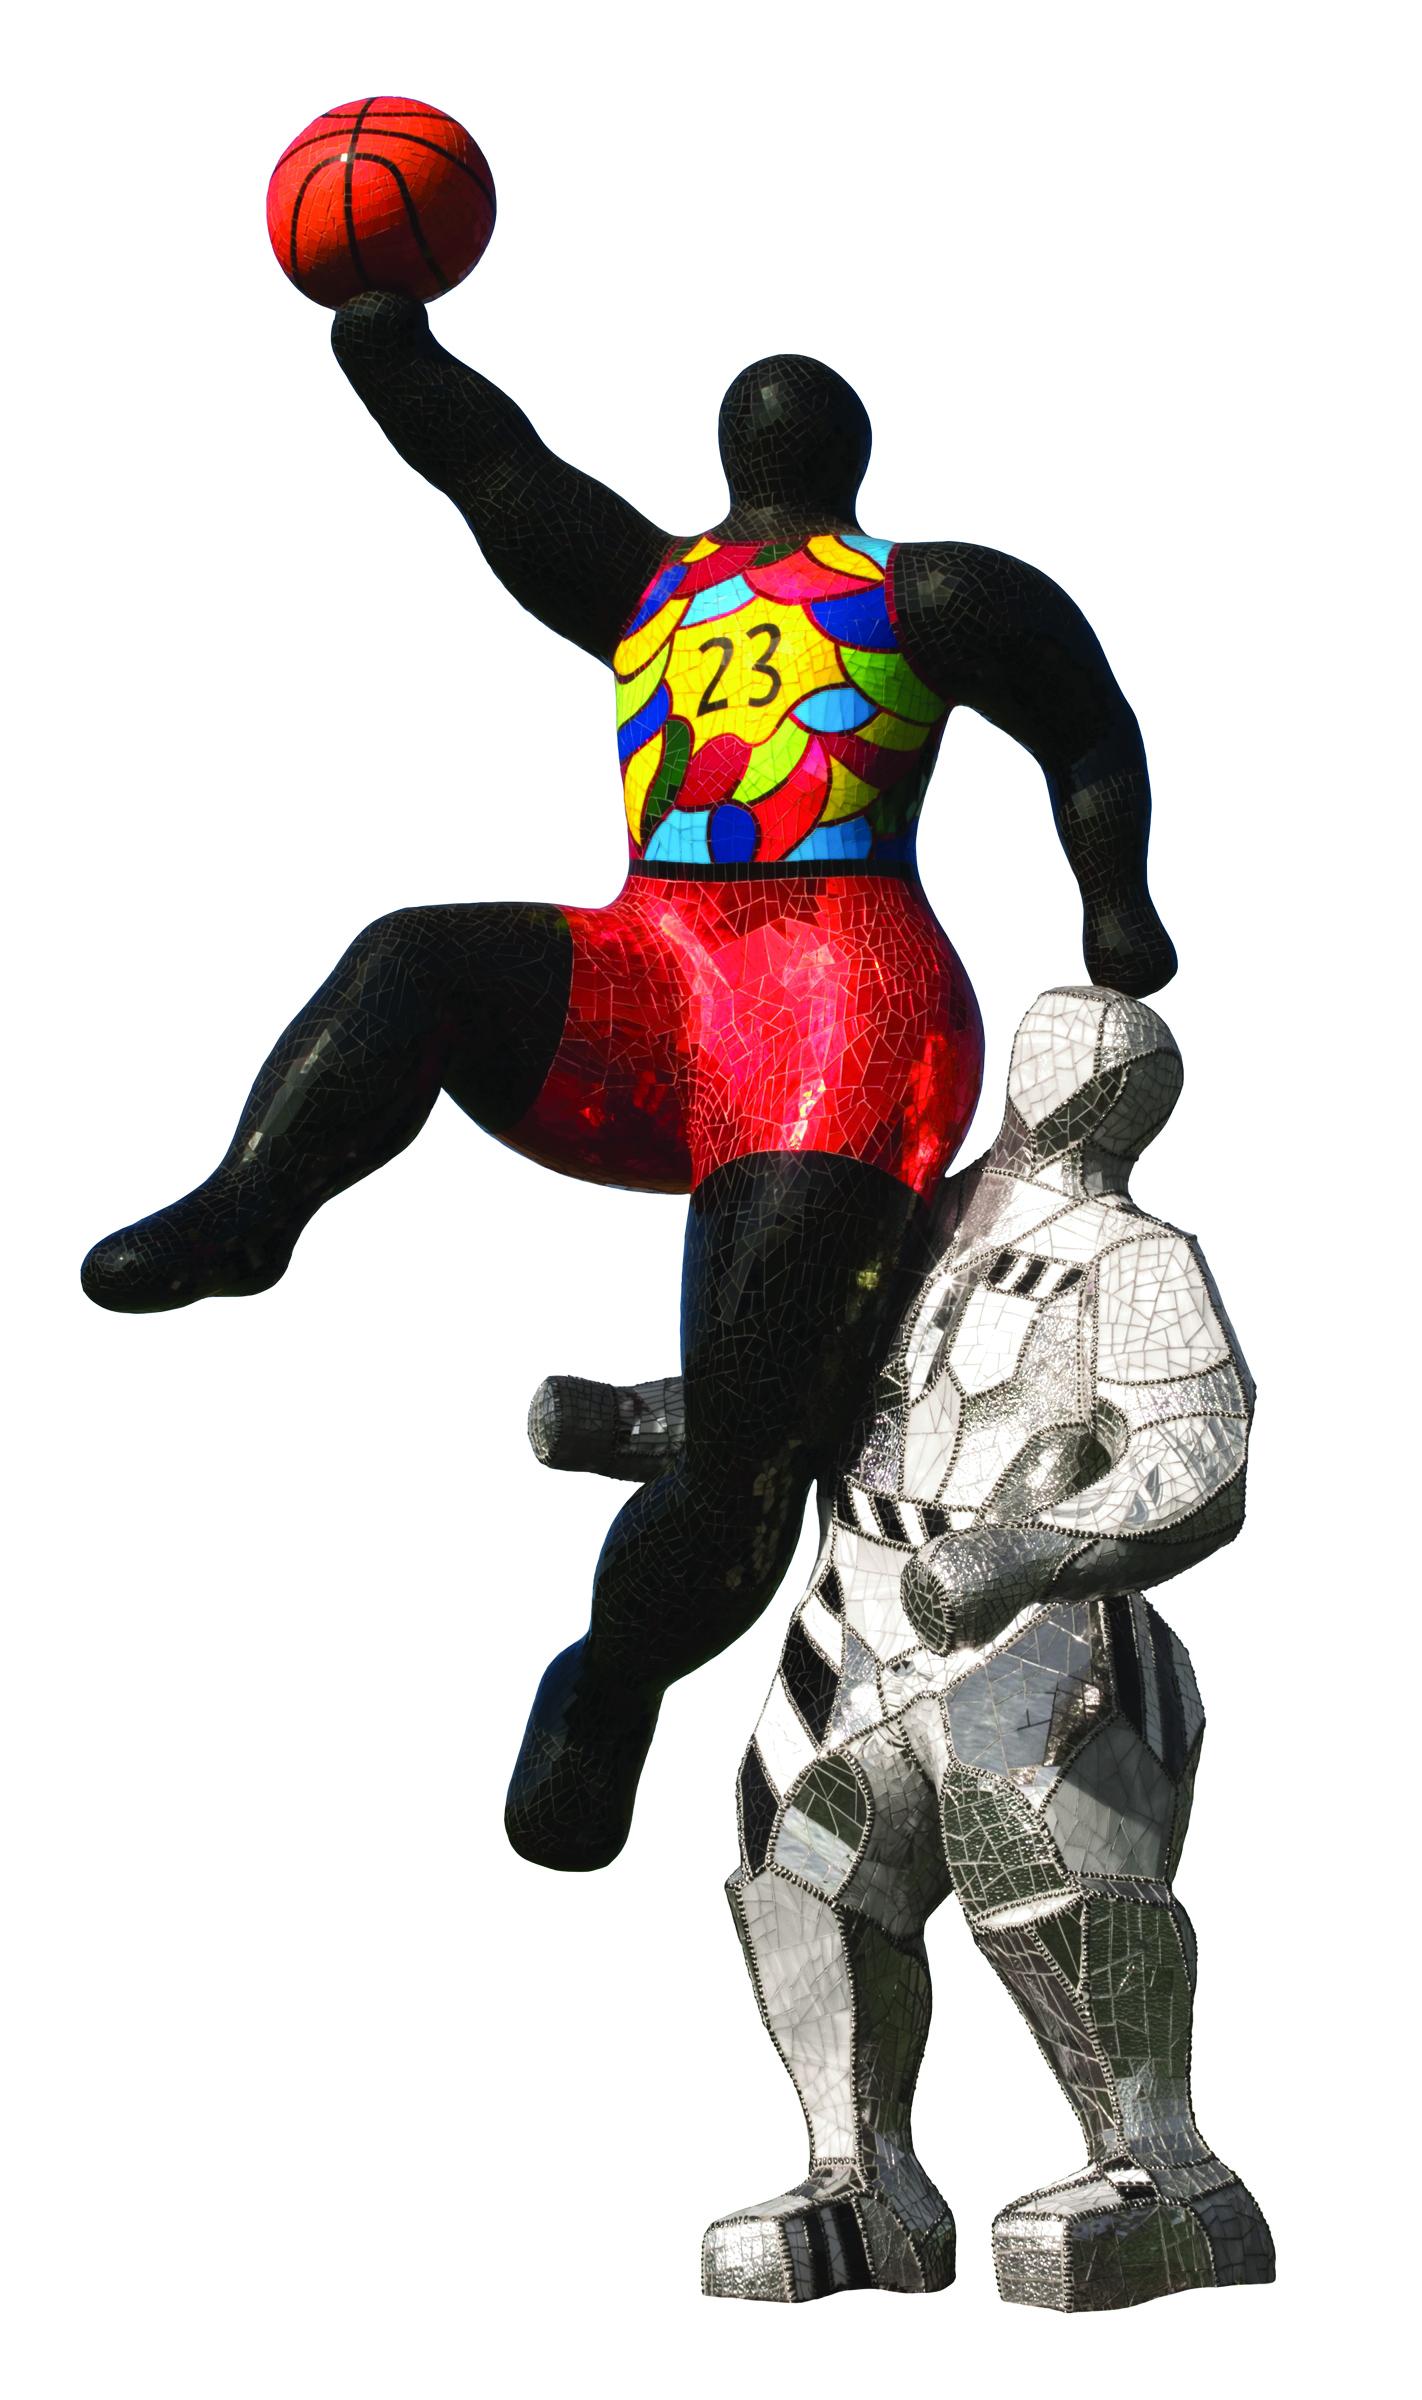 black heroes  niki de saint phalle u0026 39 s homage to prominent